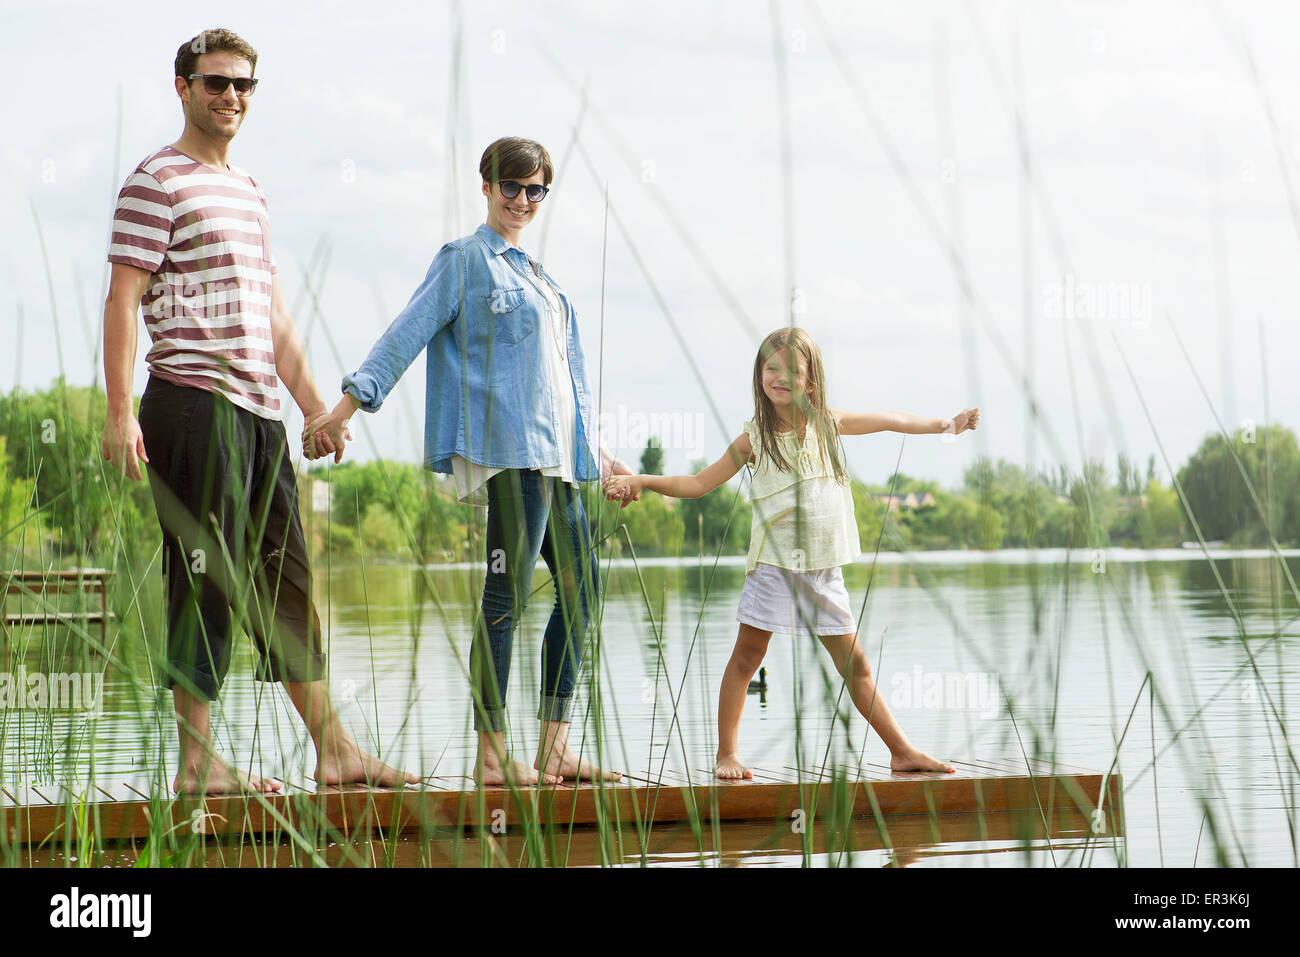 Family holding hands on dock, portrait Banque D'Images